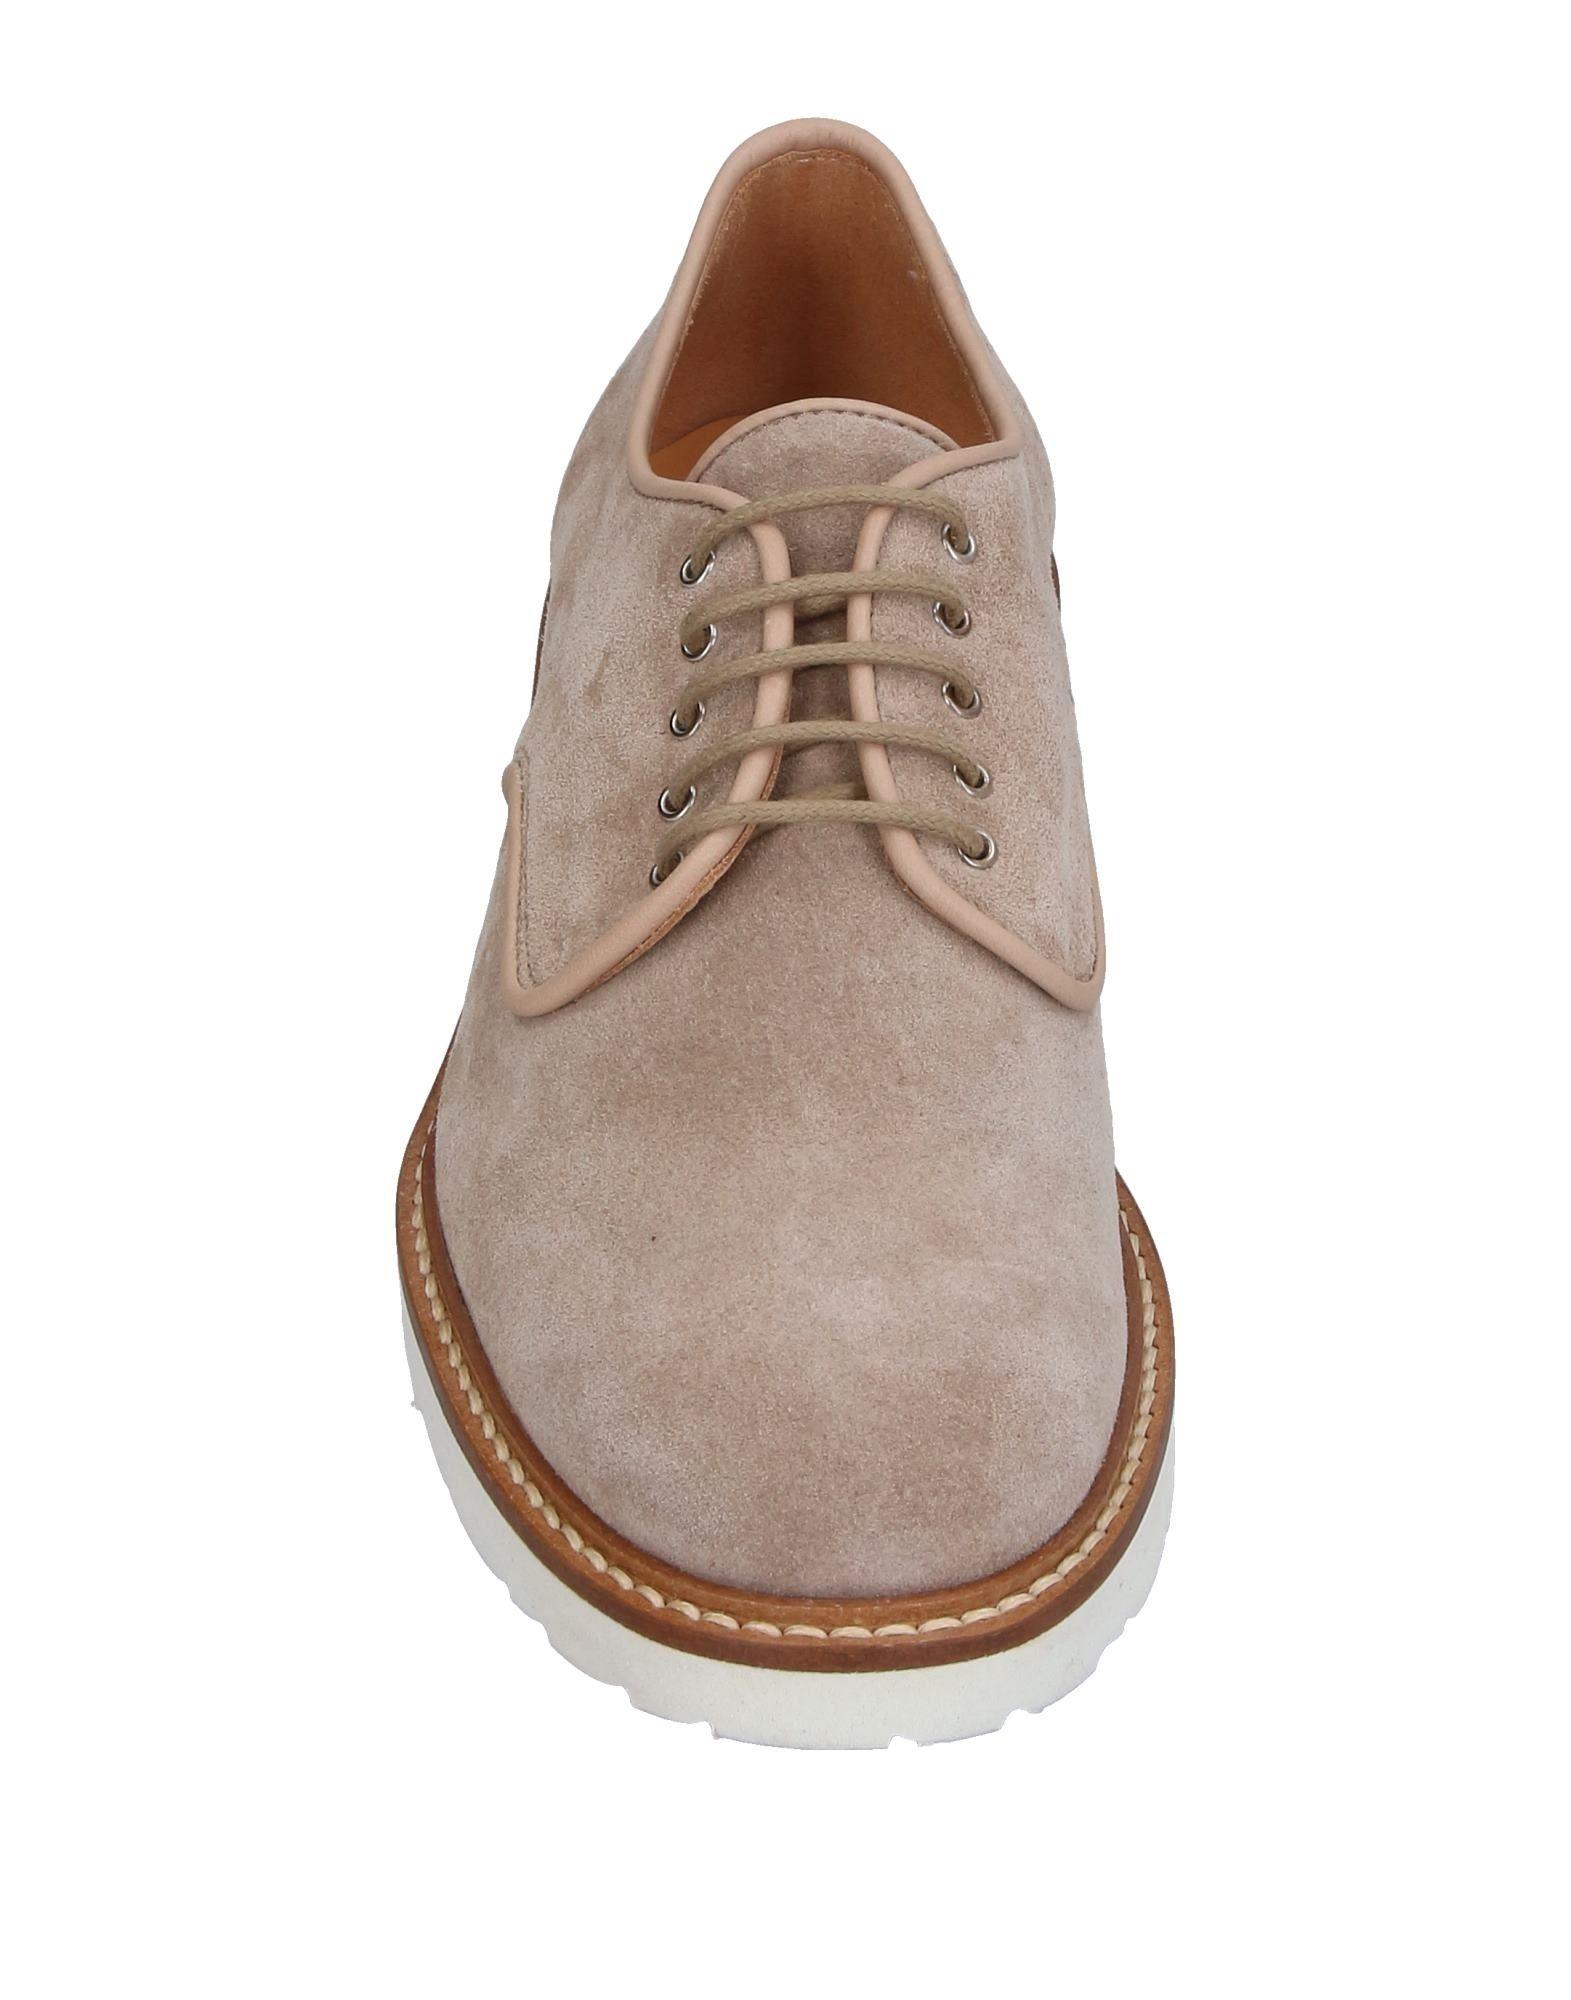 CHAUSSURES - Chaussures à lacetsBotticelli 4bA8YuD1